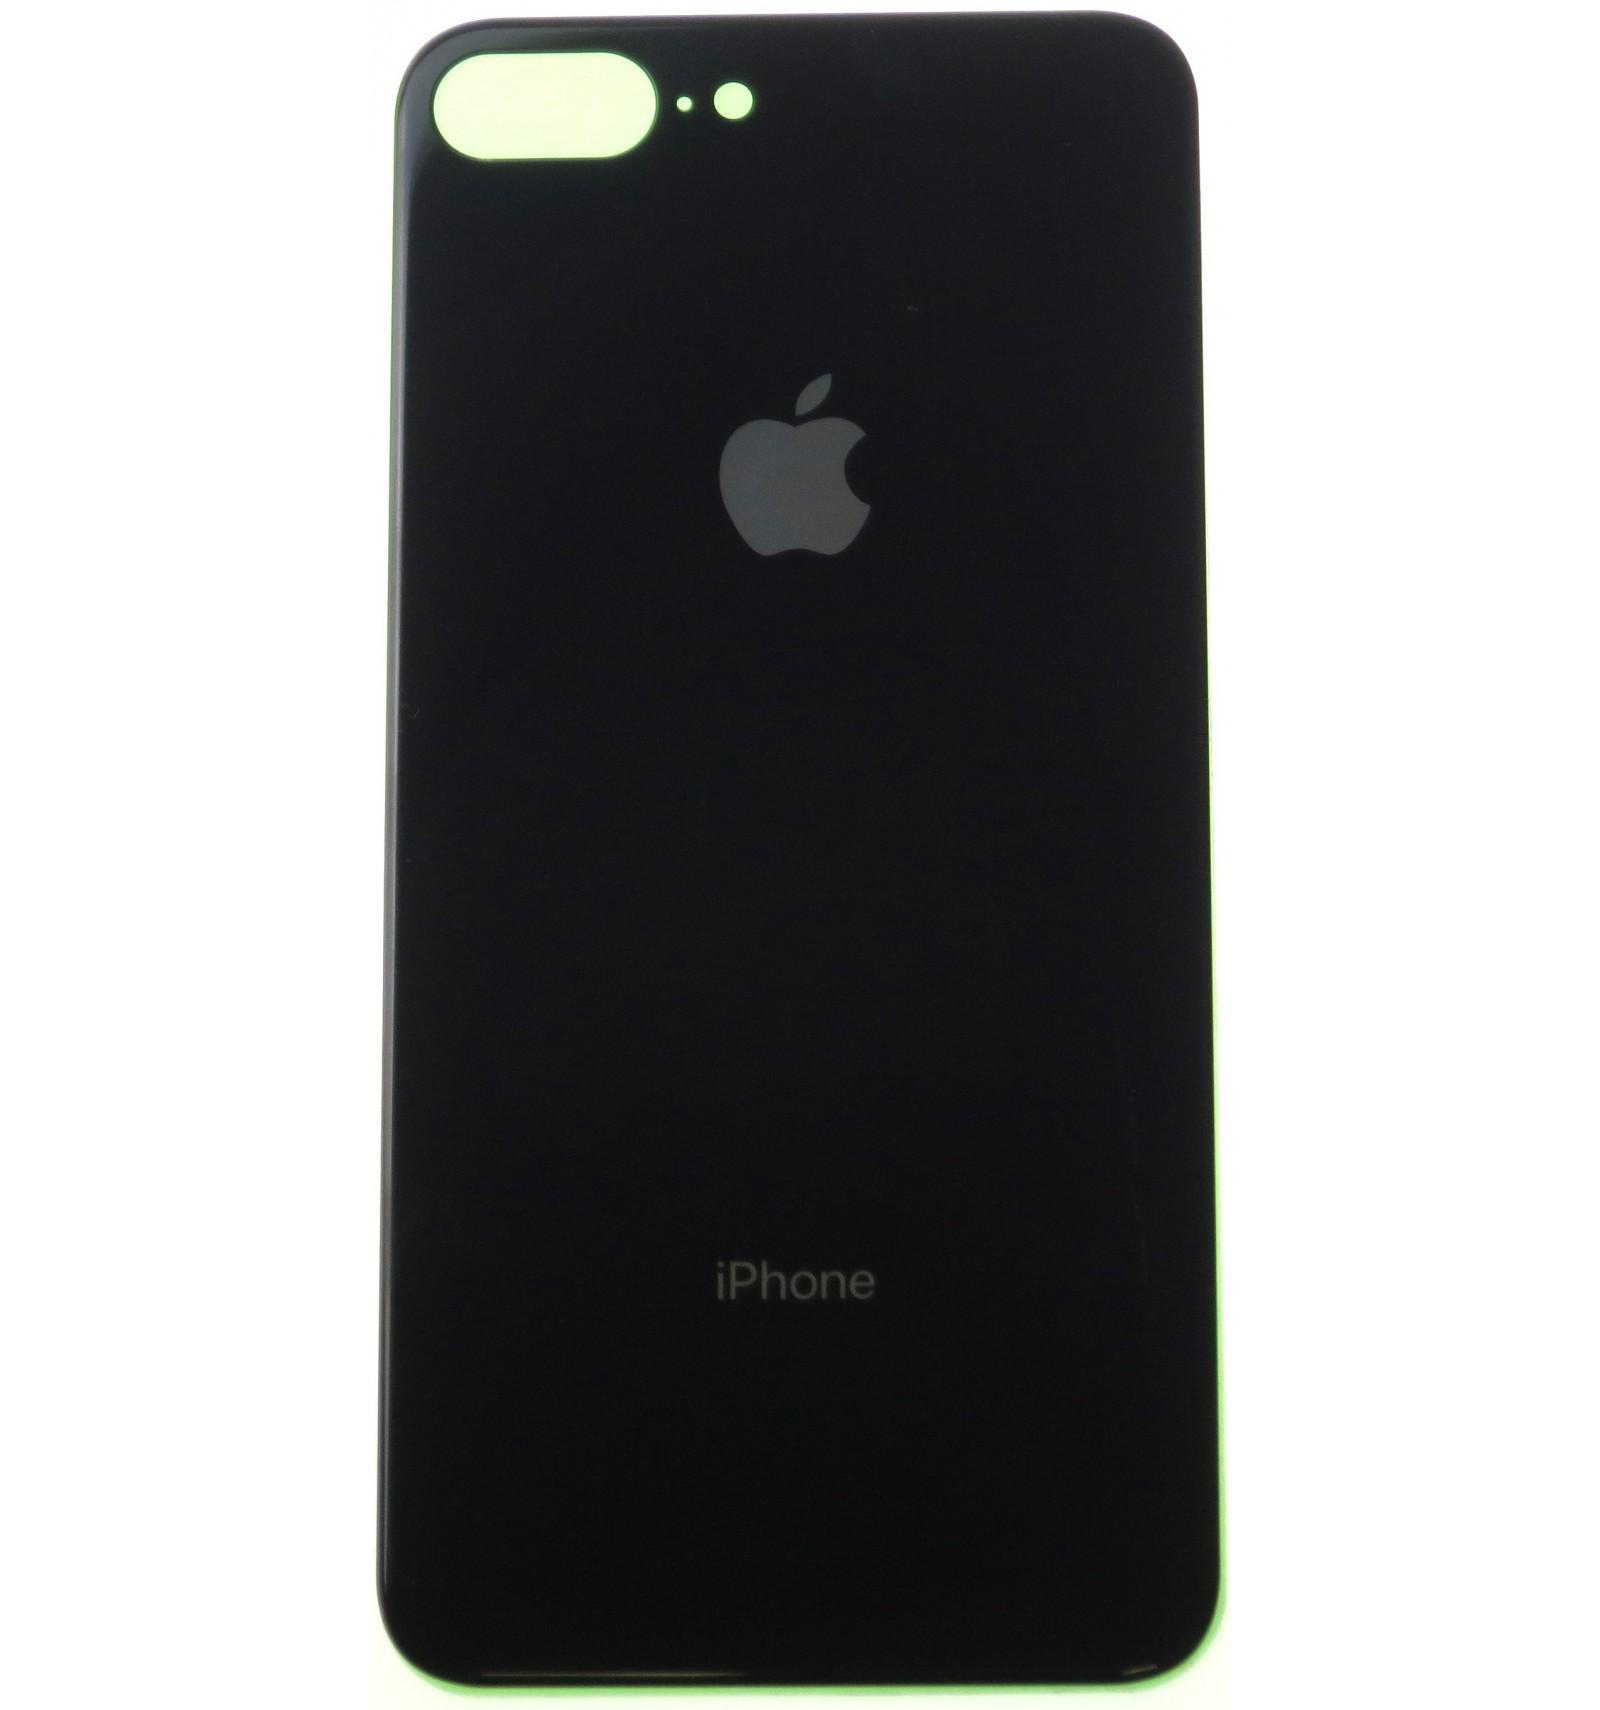 Oem Apple Iphone Parts